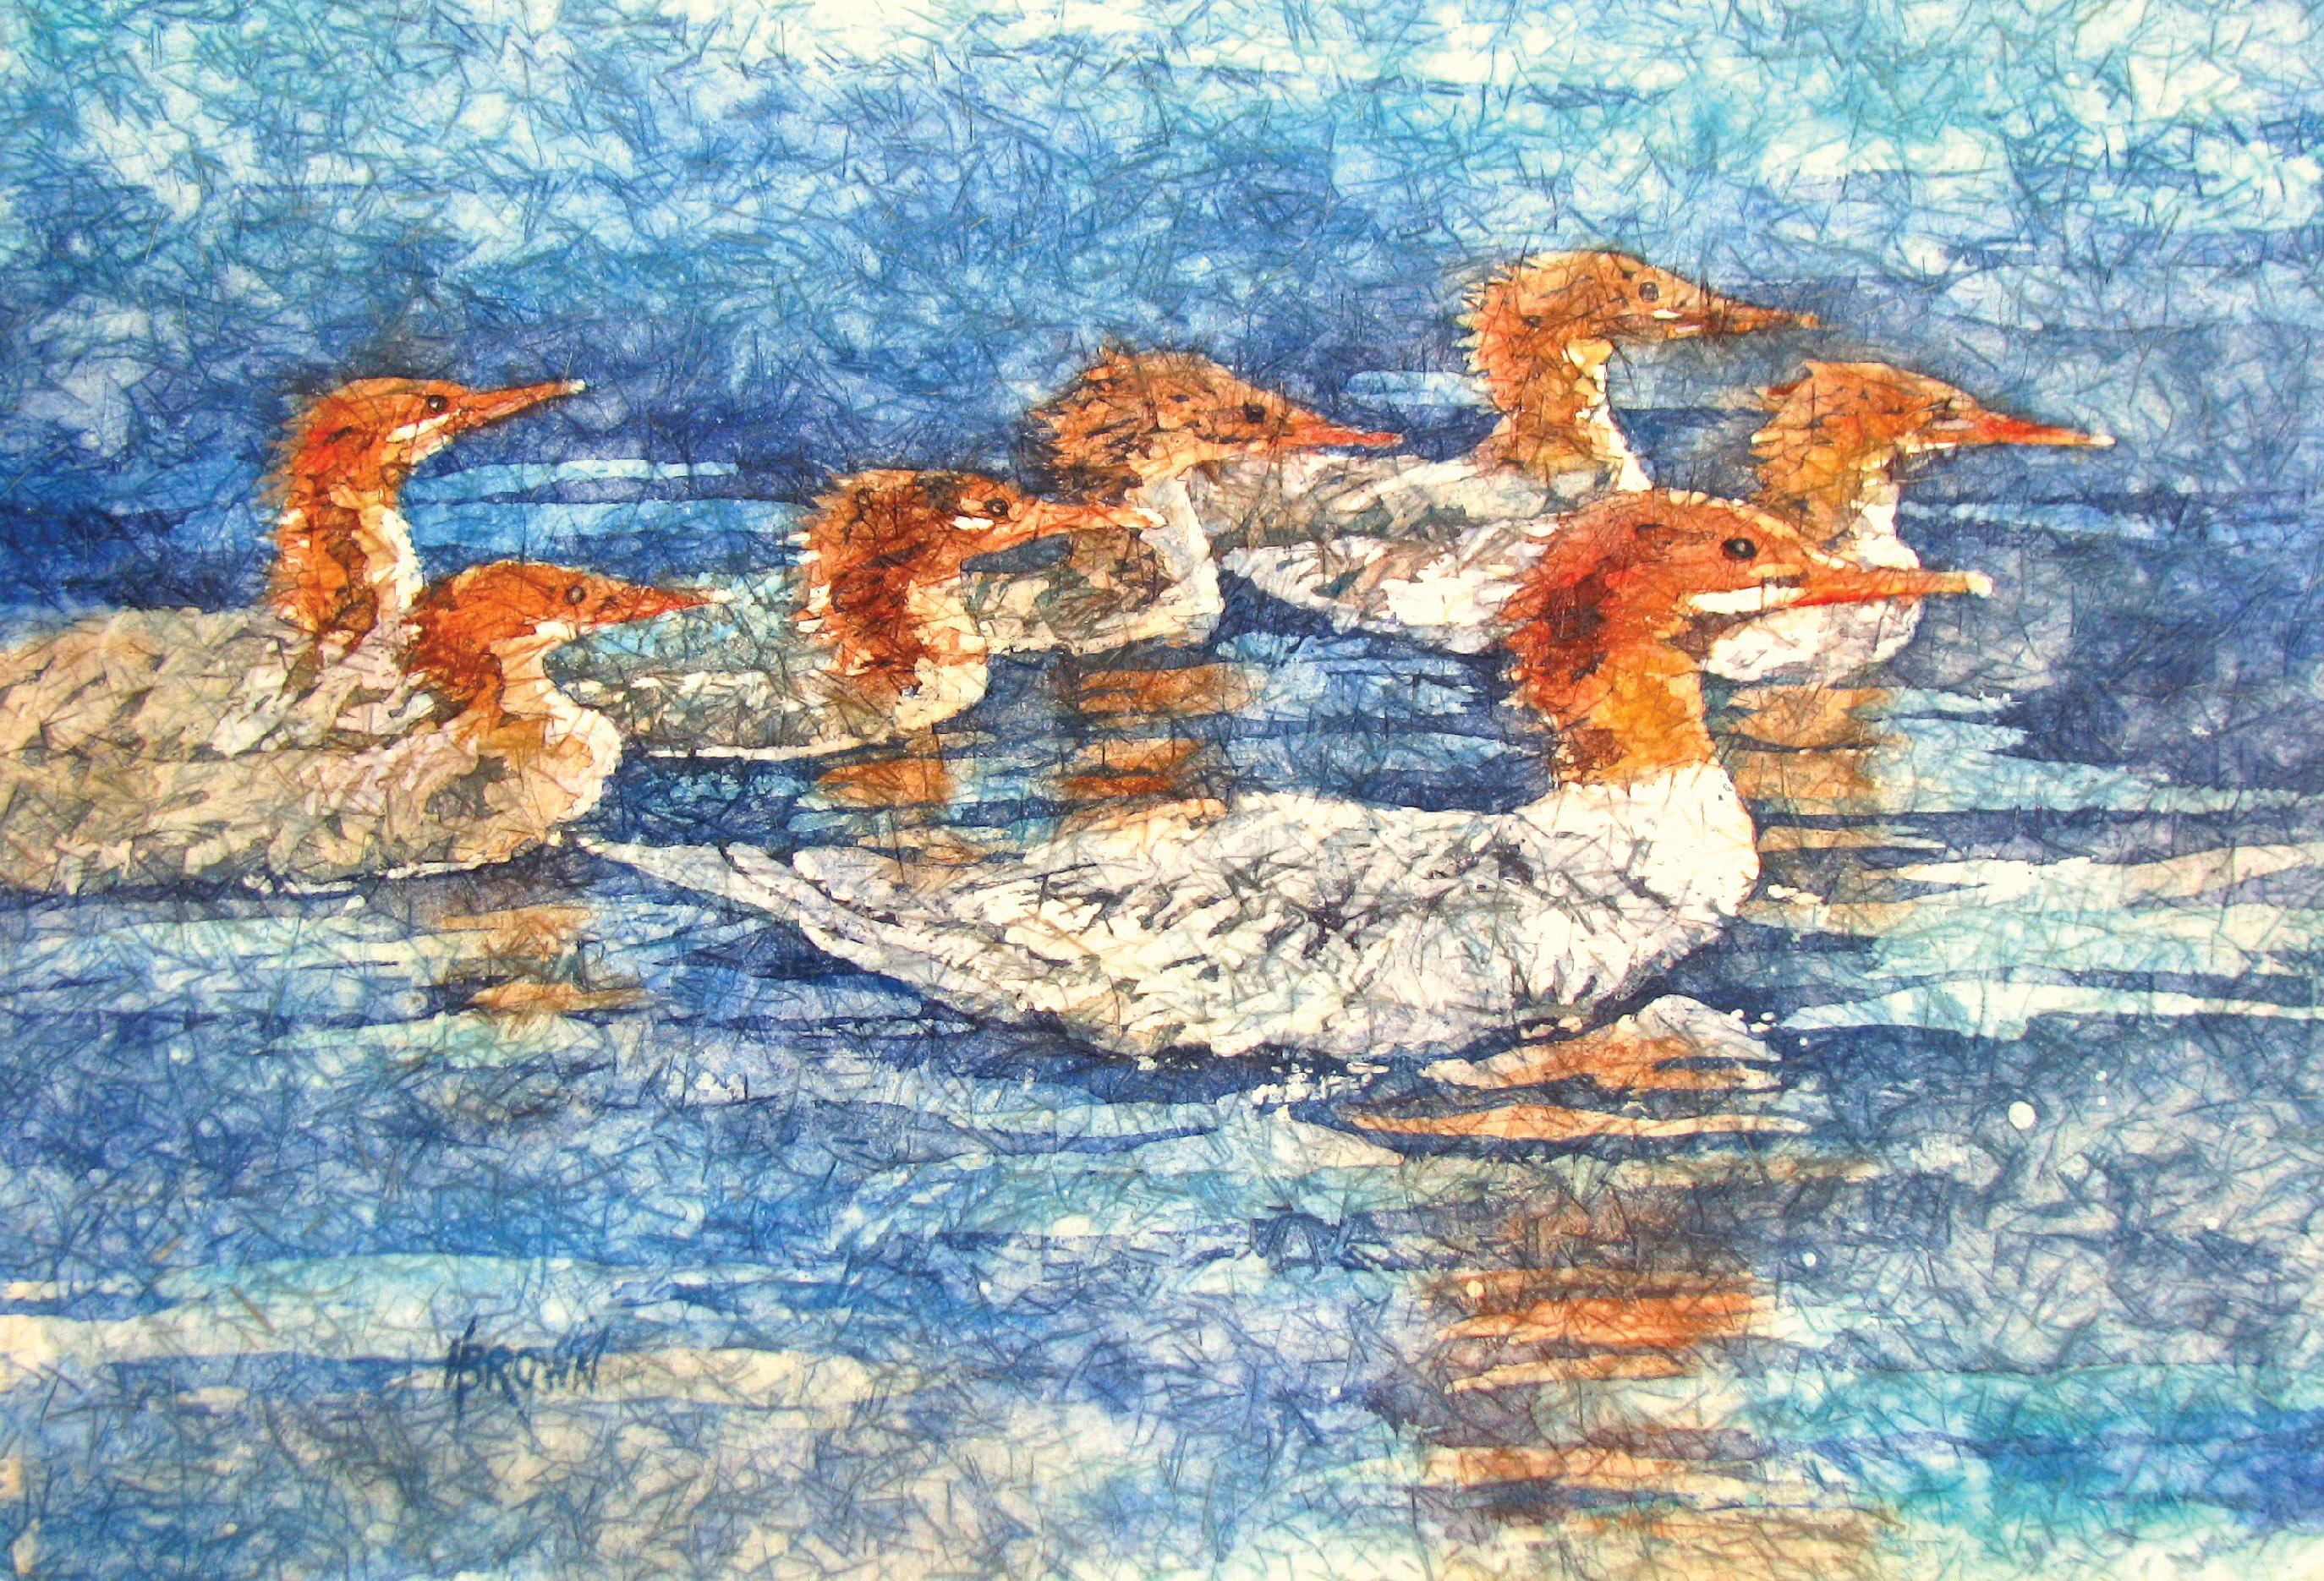 Mergansers by Helen Brown